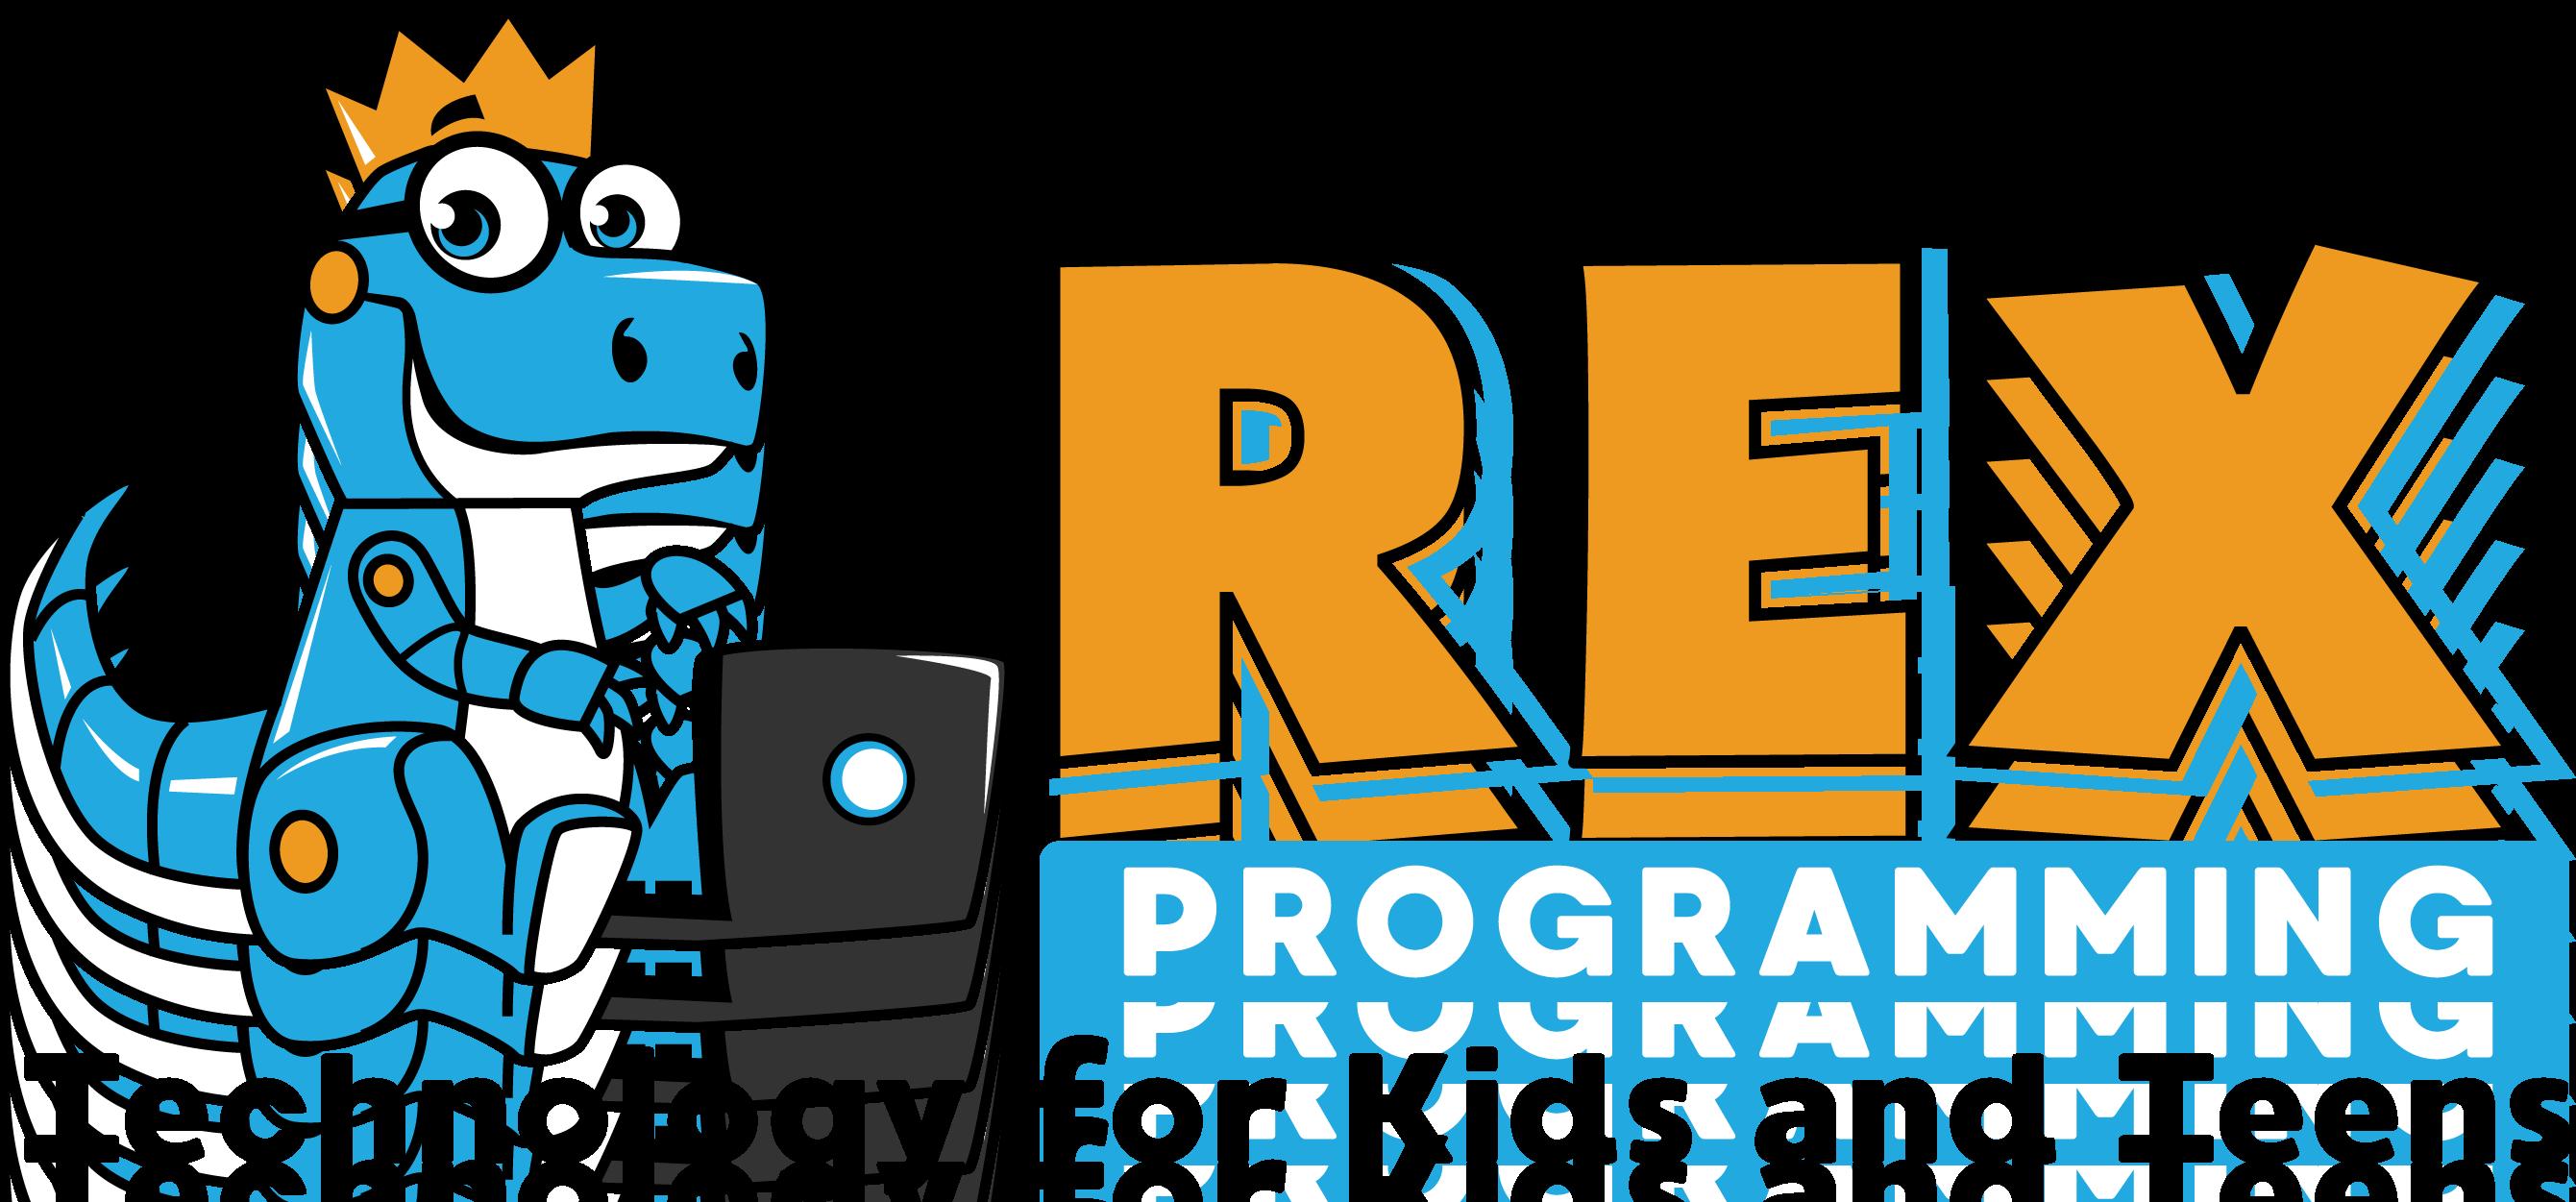 Rex Programm